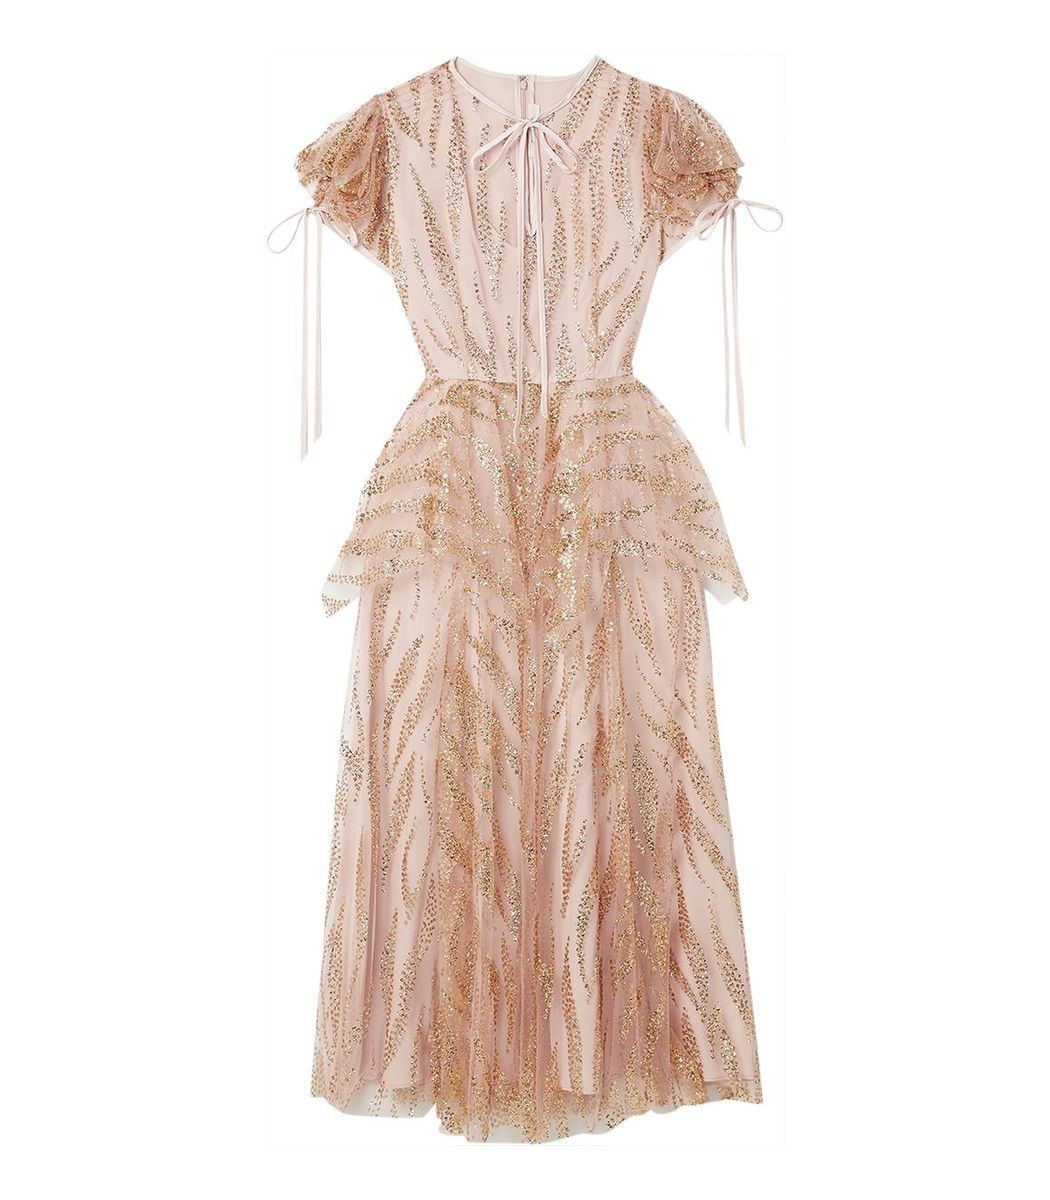 Rodarte Gold And Mauve Glitter Tulle Dress